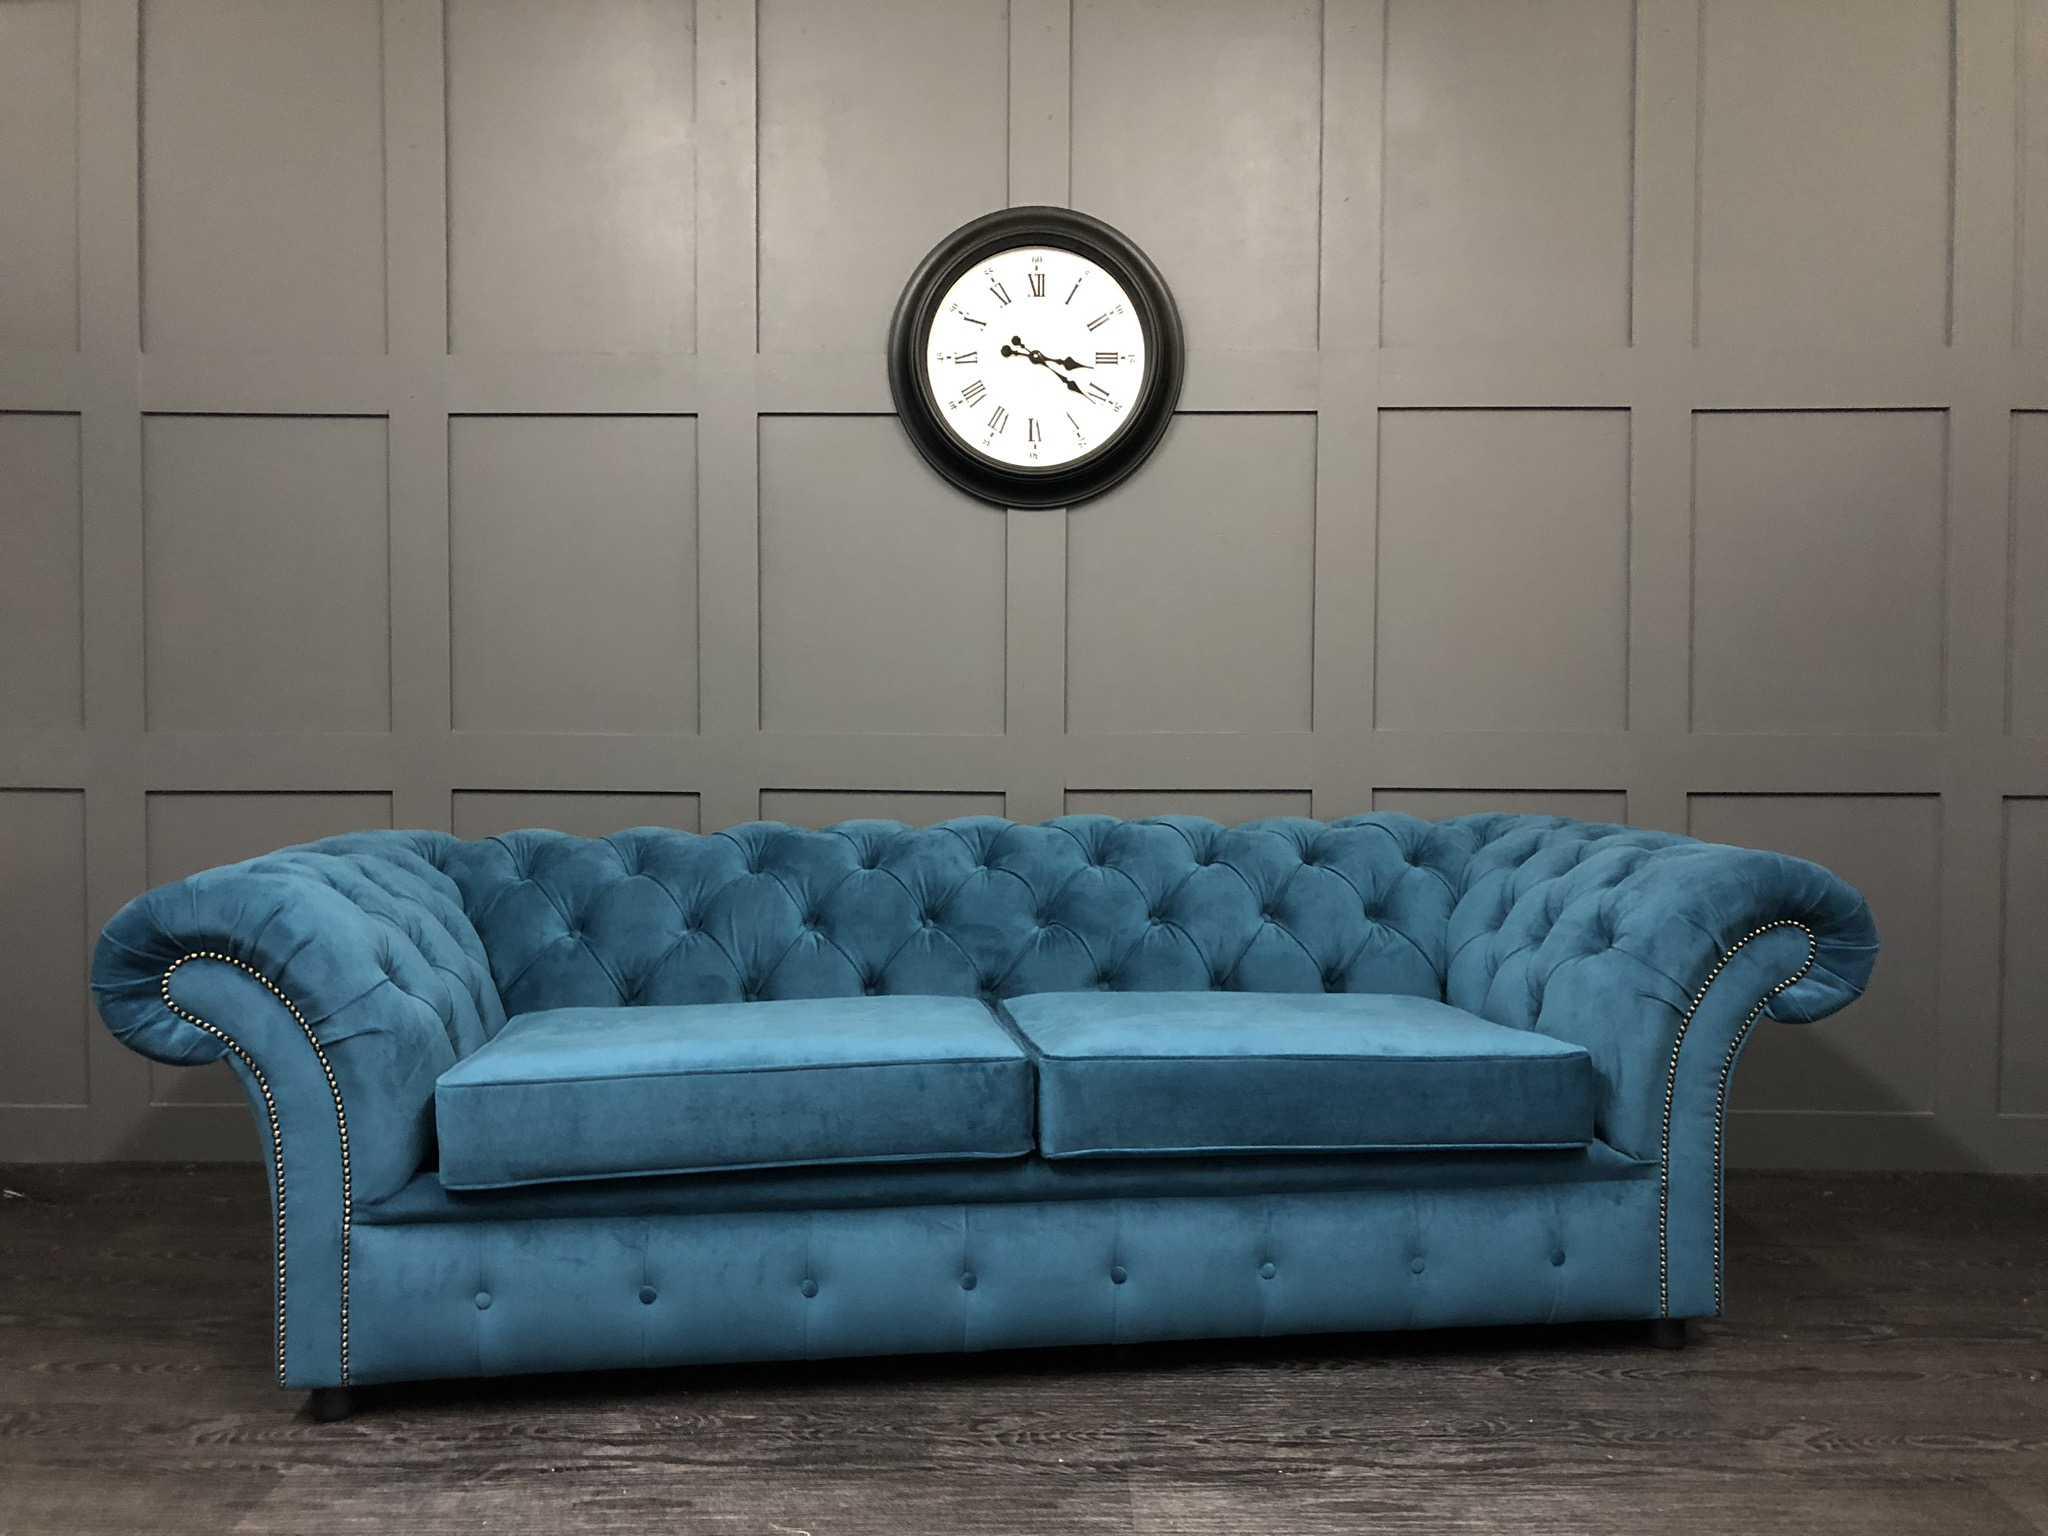 London chesterfield sofa bed in warwick plush velvet mallard